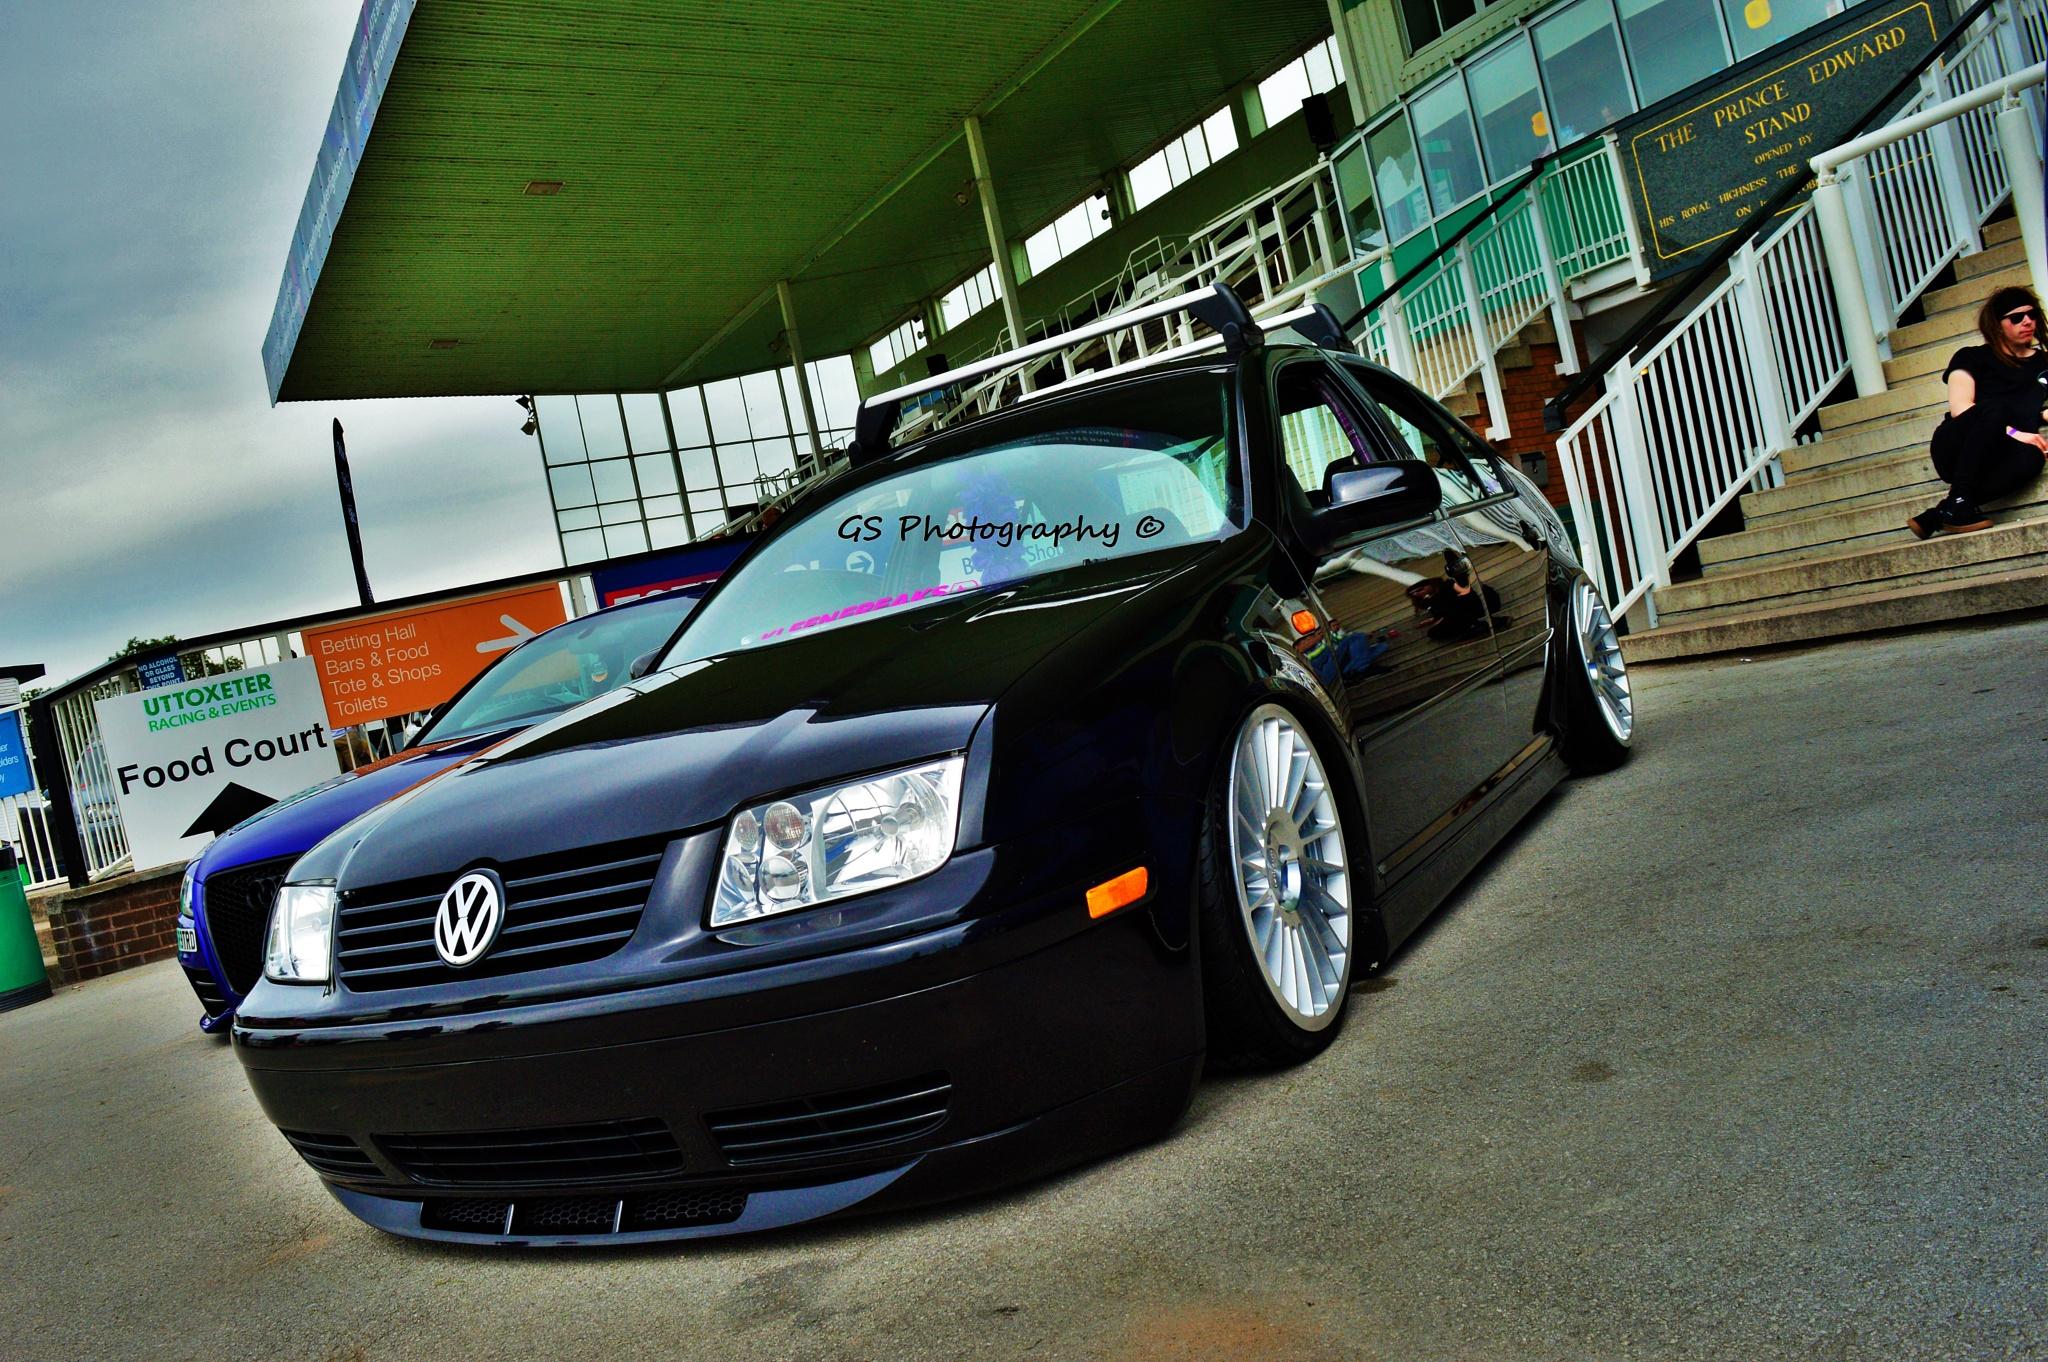 Volkswagen Bora by GeorgeSmith Photography